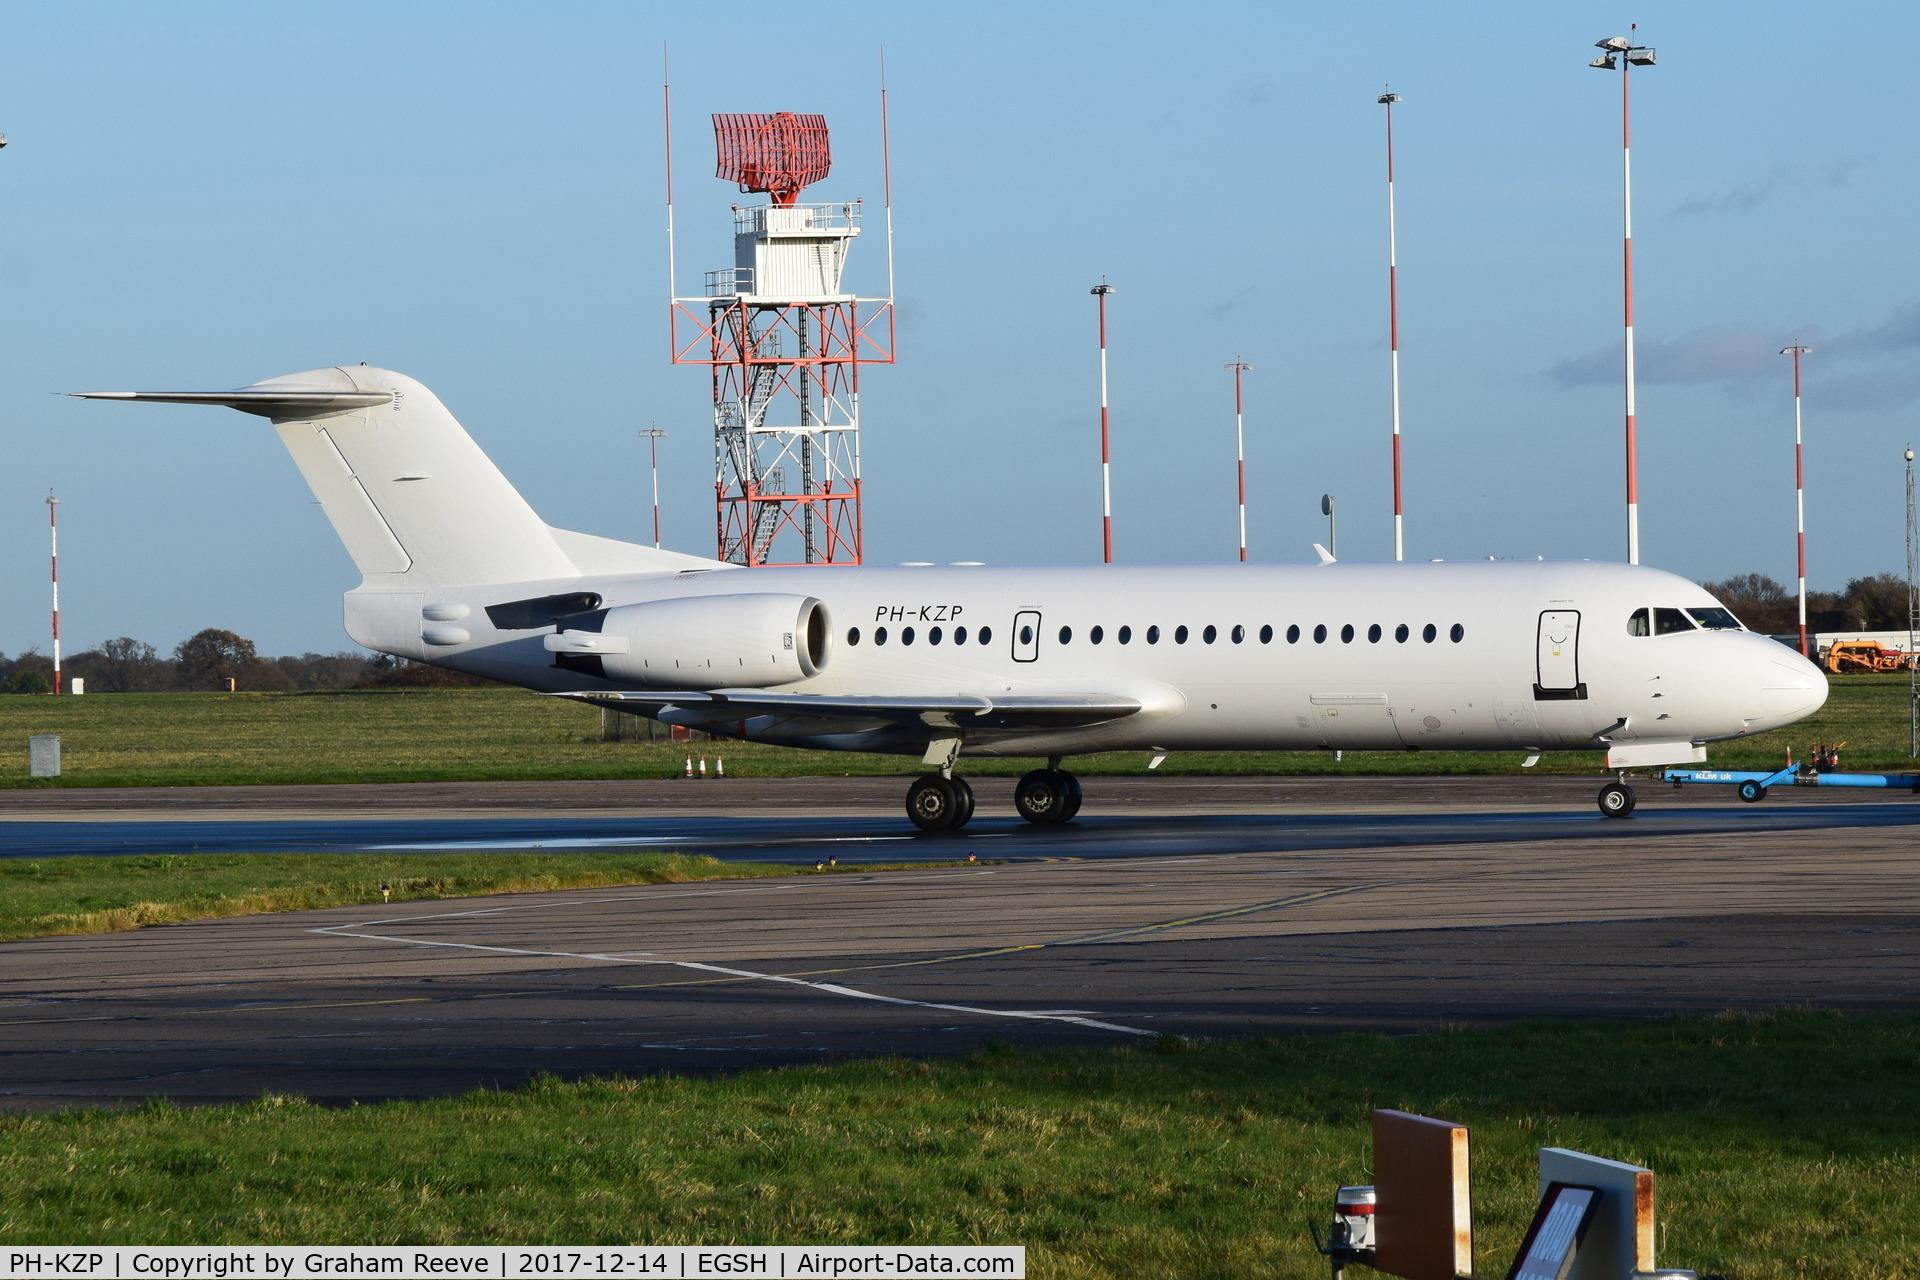 PH-KZP, 1995 Fokker F70 (F-28-0070) C/N 11539, Under tow at Norwich.